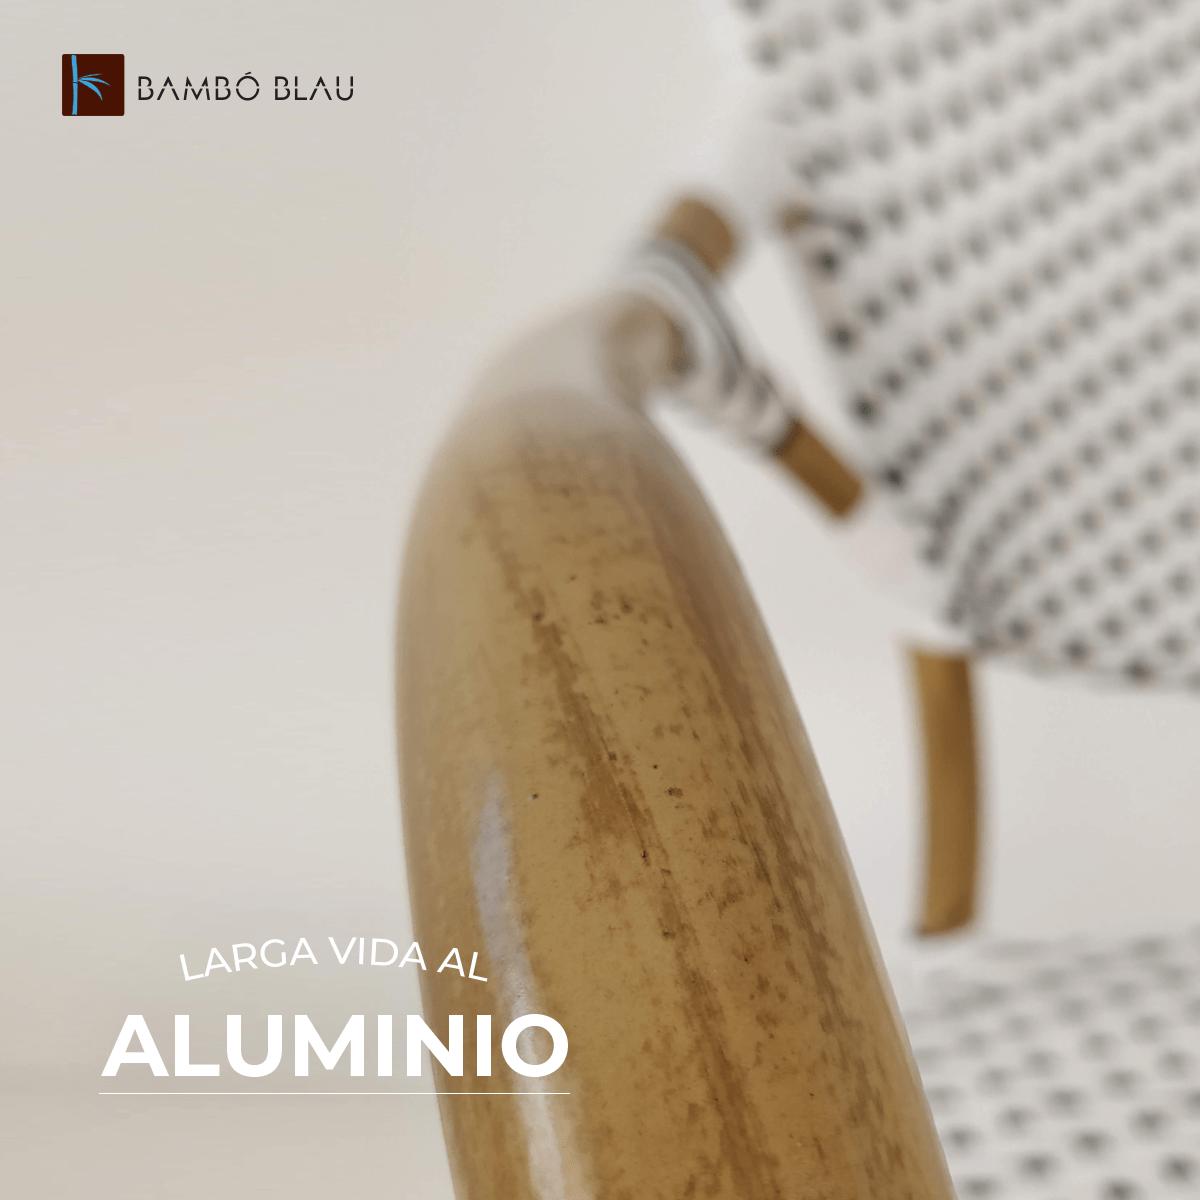 Bambó Blau Larga Vida al Aluminio